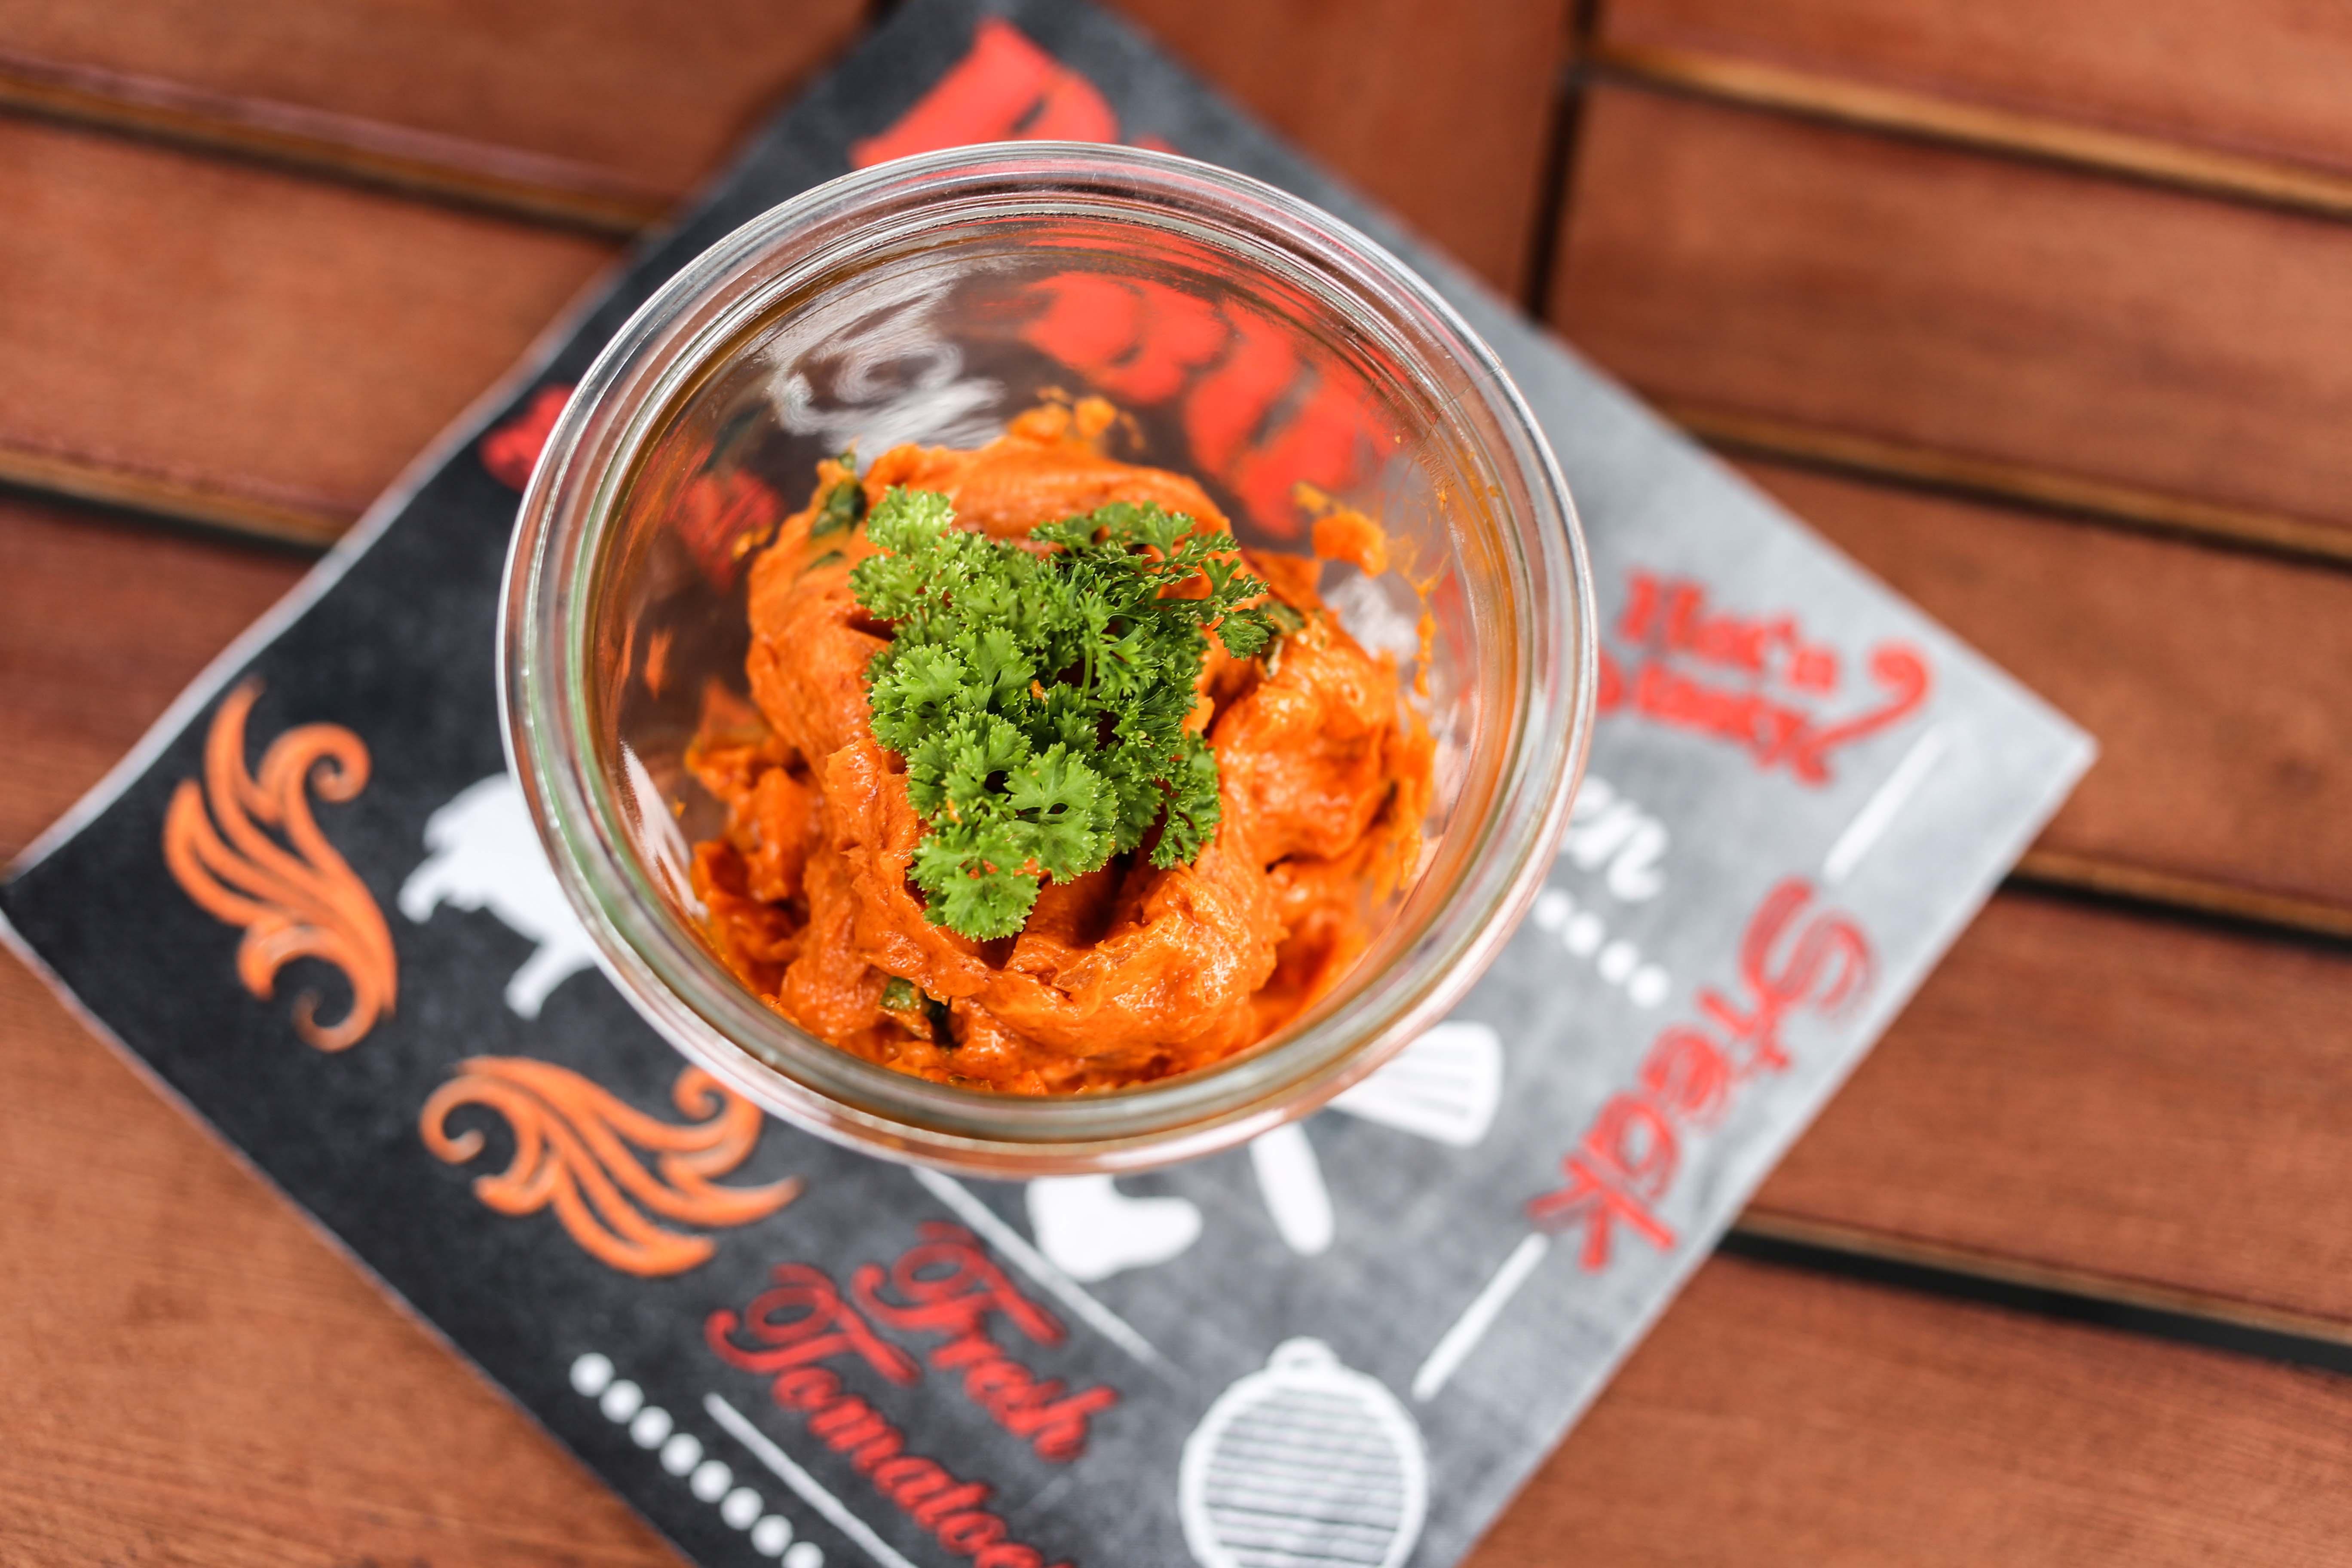 einfache-tomatenbutter-rezept-lecker-schnell-grillen-food-foodblog_1246